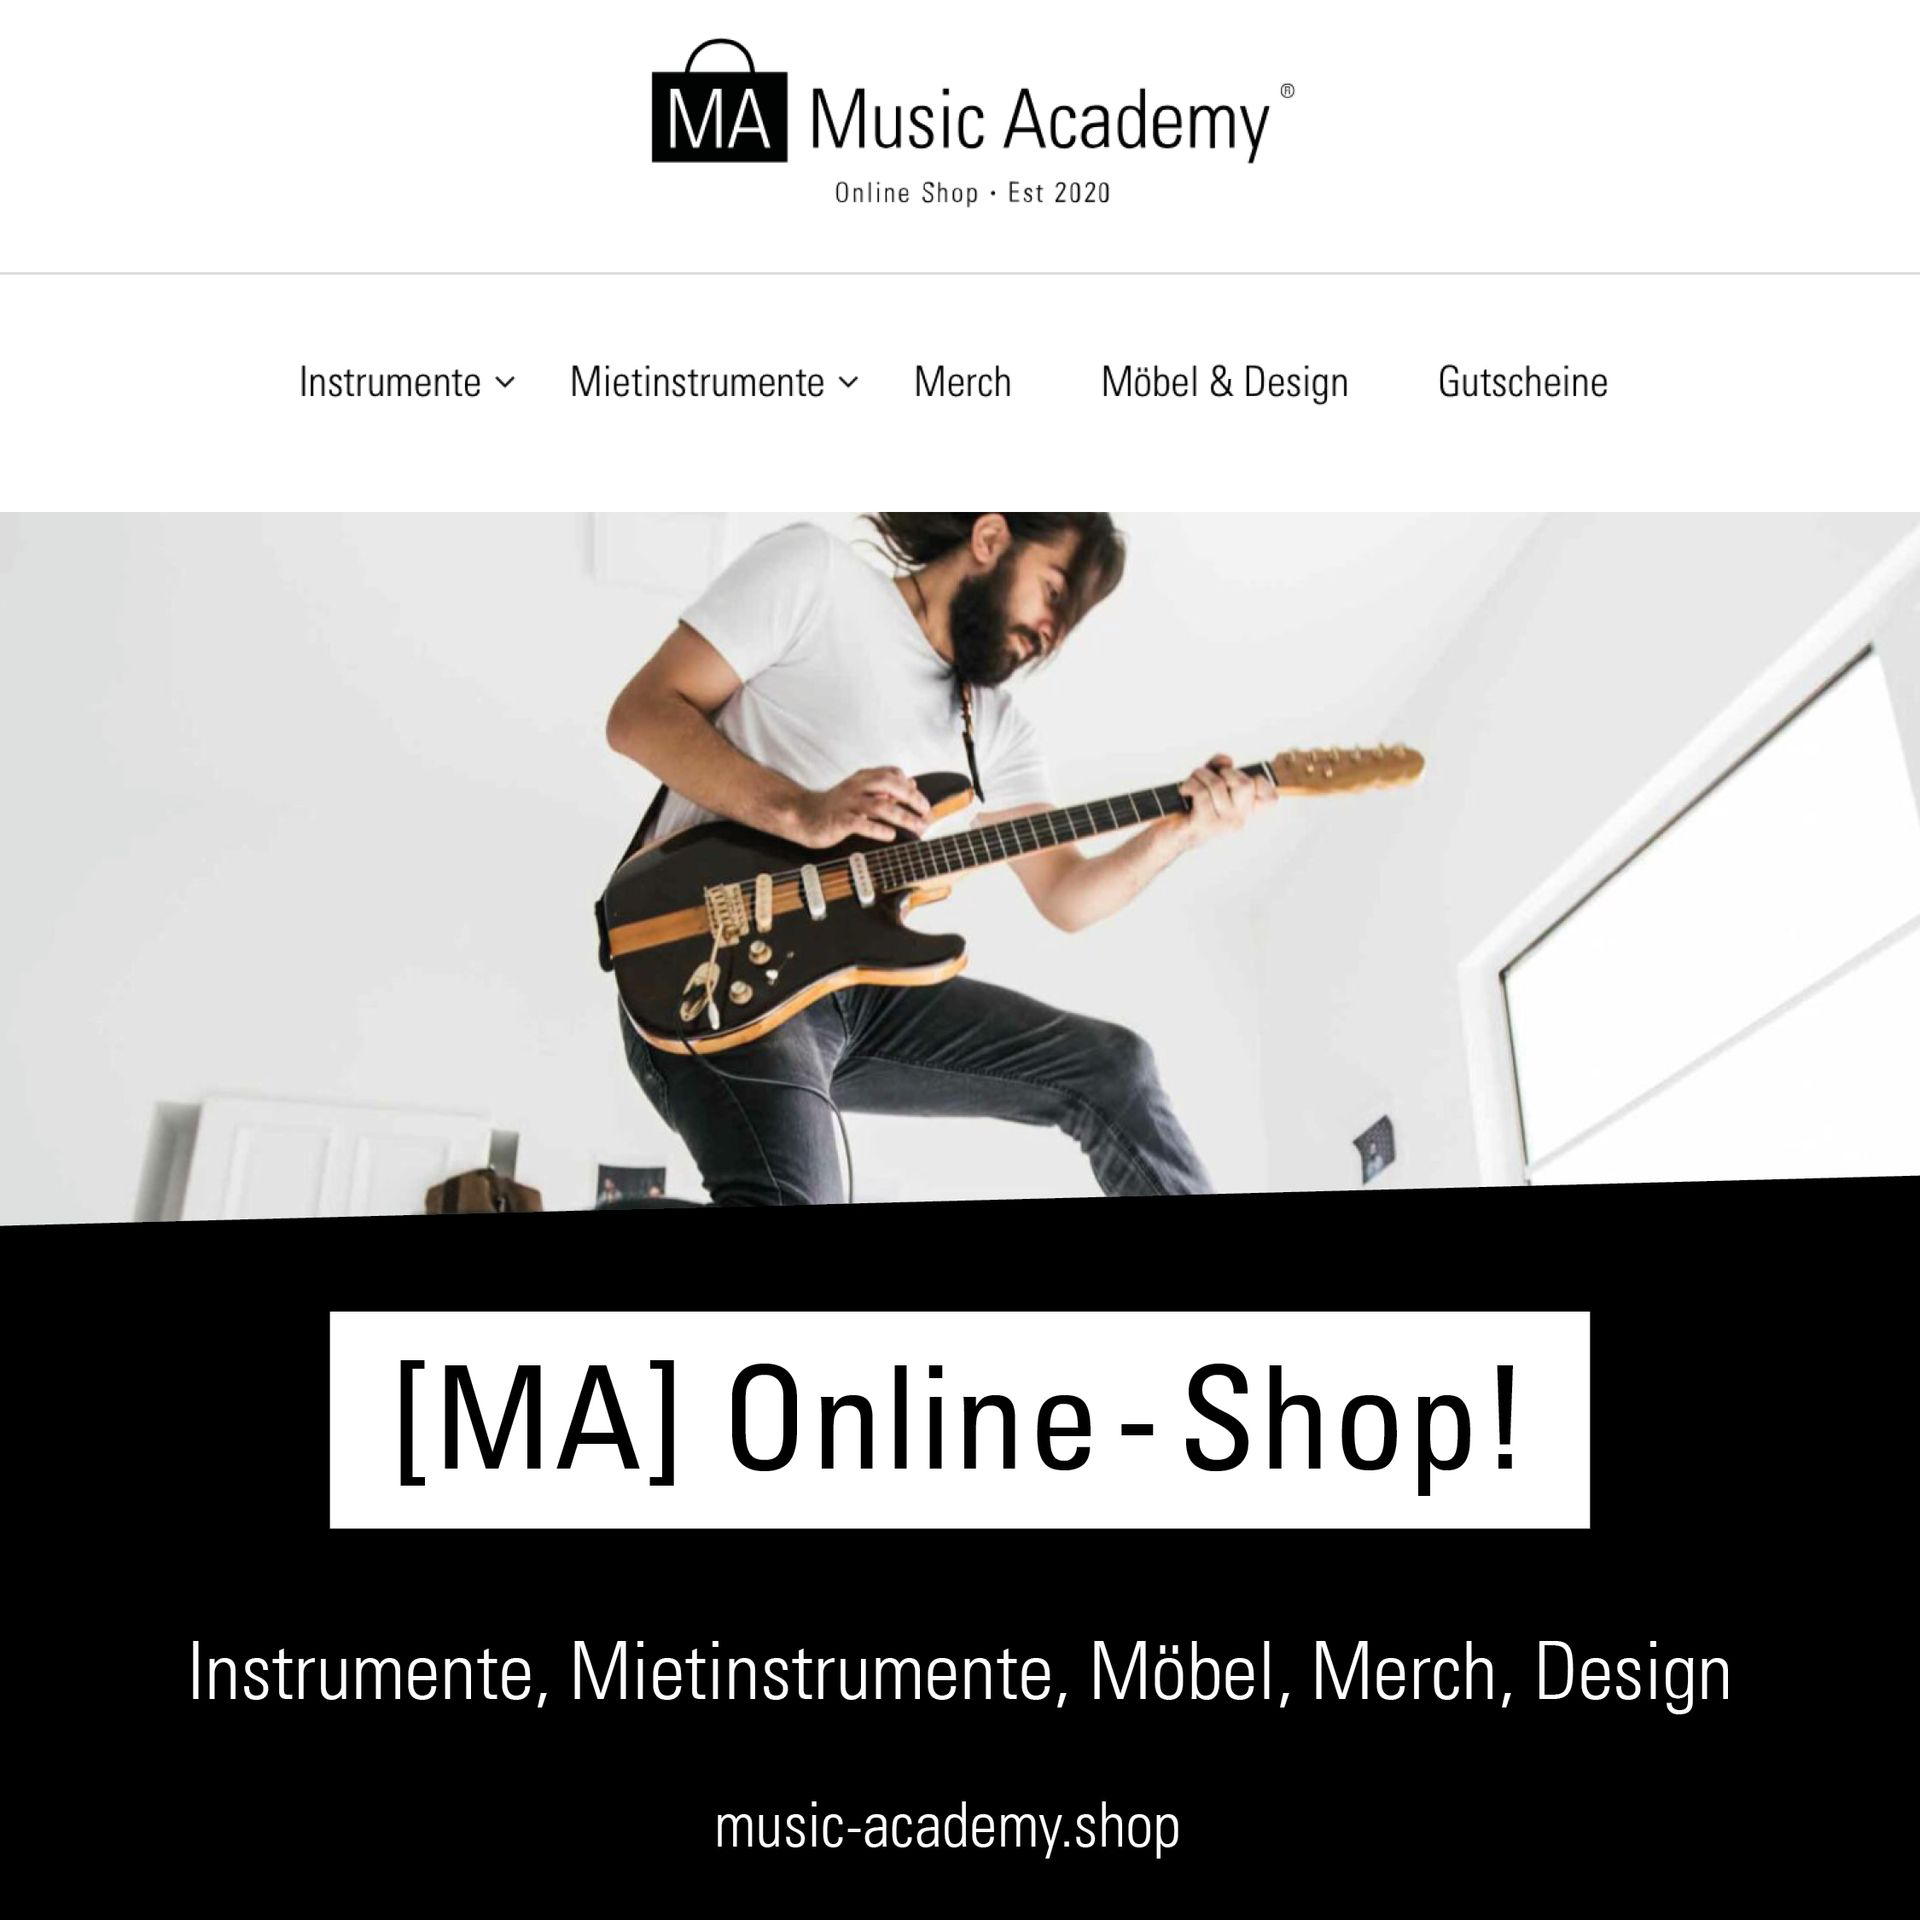 [MA] Music Academy Online Shop!